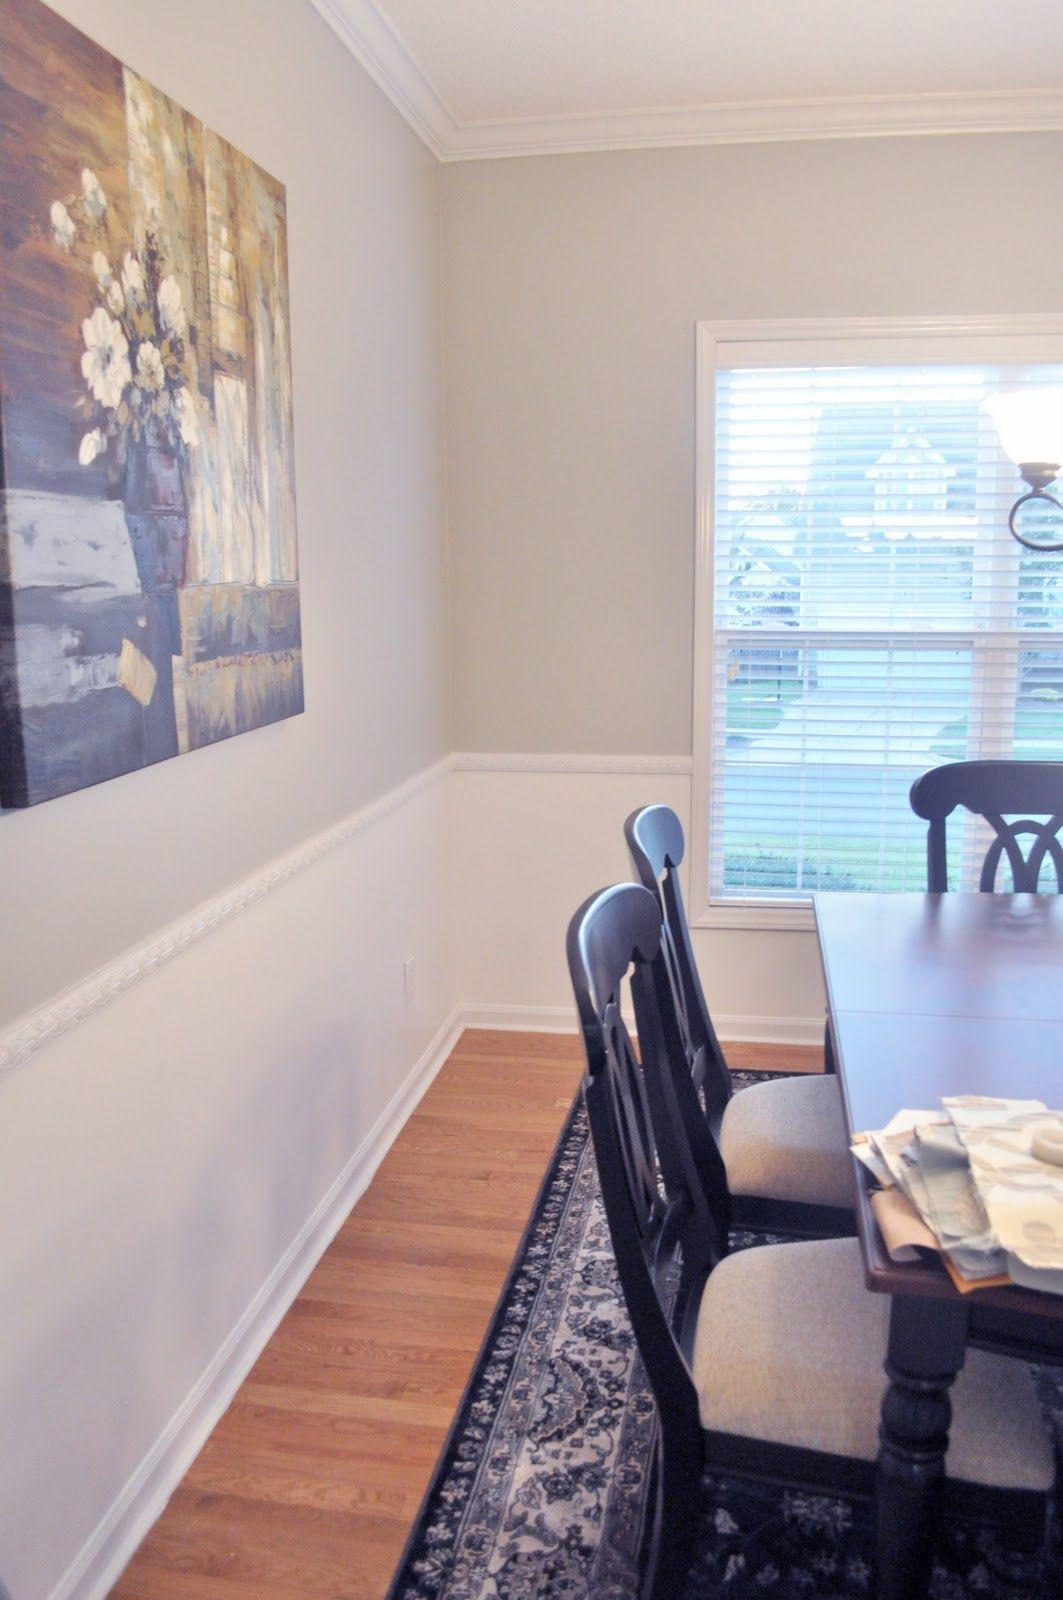 Awe Inspiring Rooms Chair Rails Download Dining Rooms With Chair Rails Download Free Architecture Designs Rallybritishbridgeorg